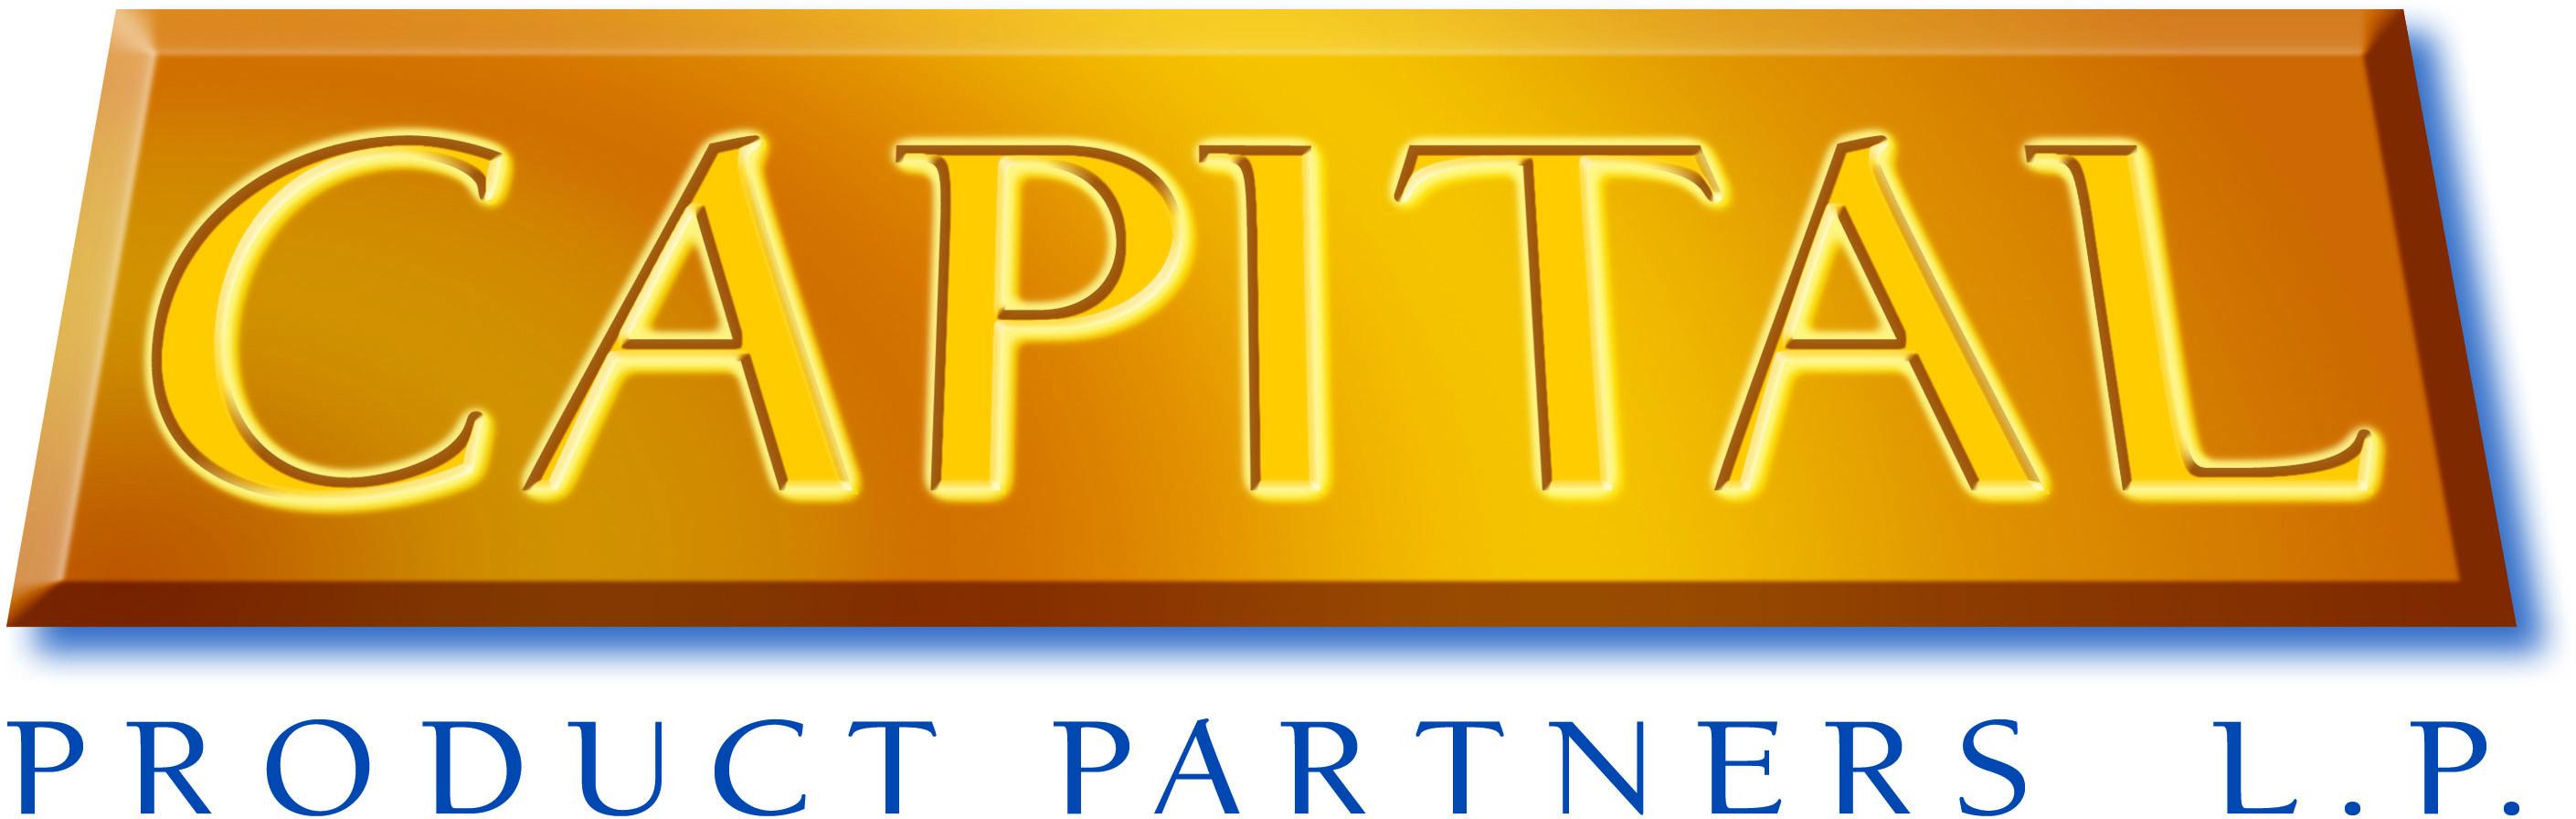 Capital Product Partners L.P. logo